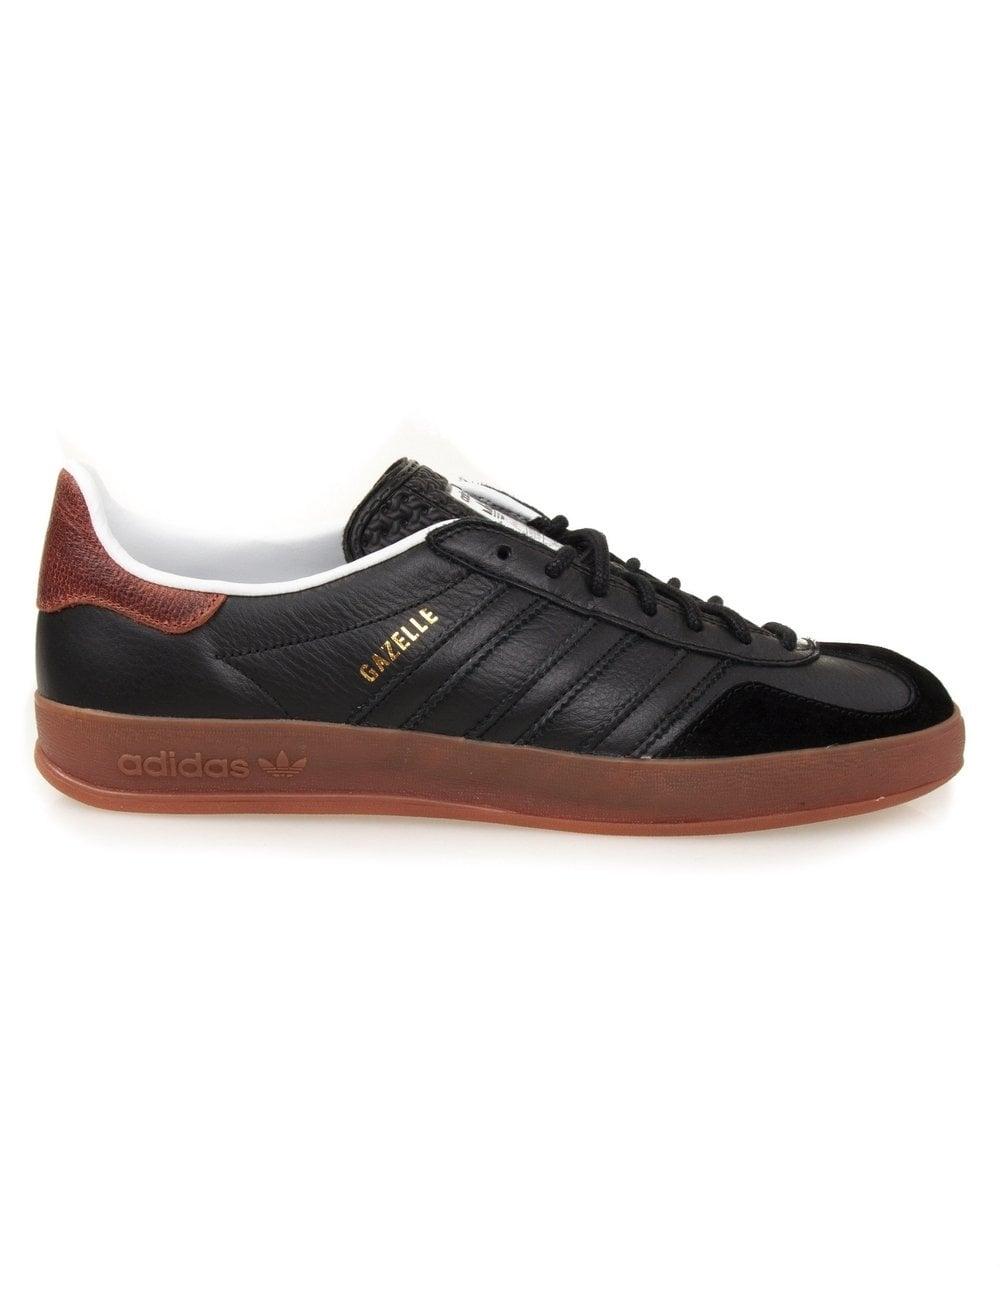 Adidas Originals Gazelle Indoor - Black - Footwear from Fat Buddha ... 57770efa4